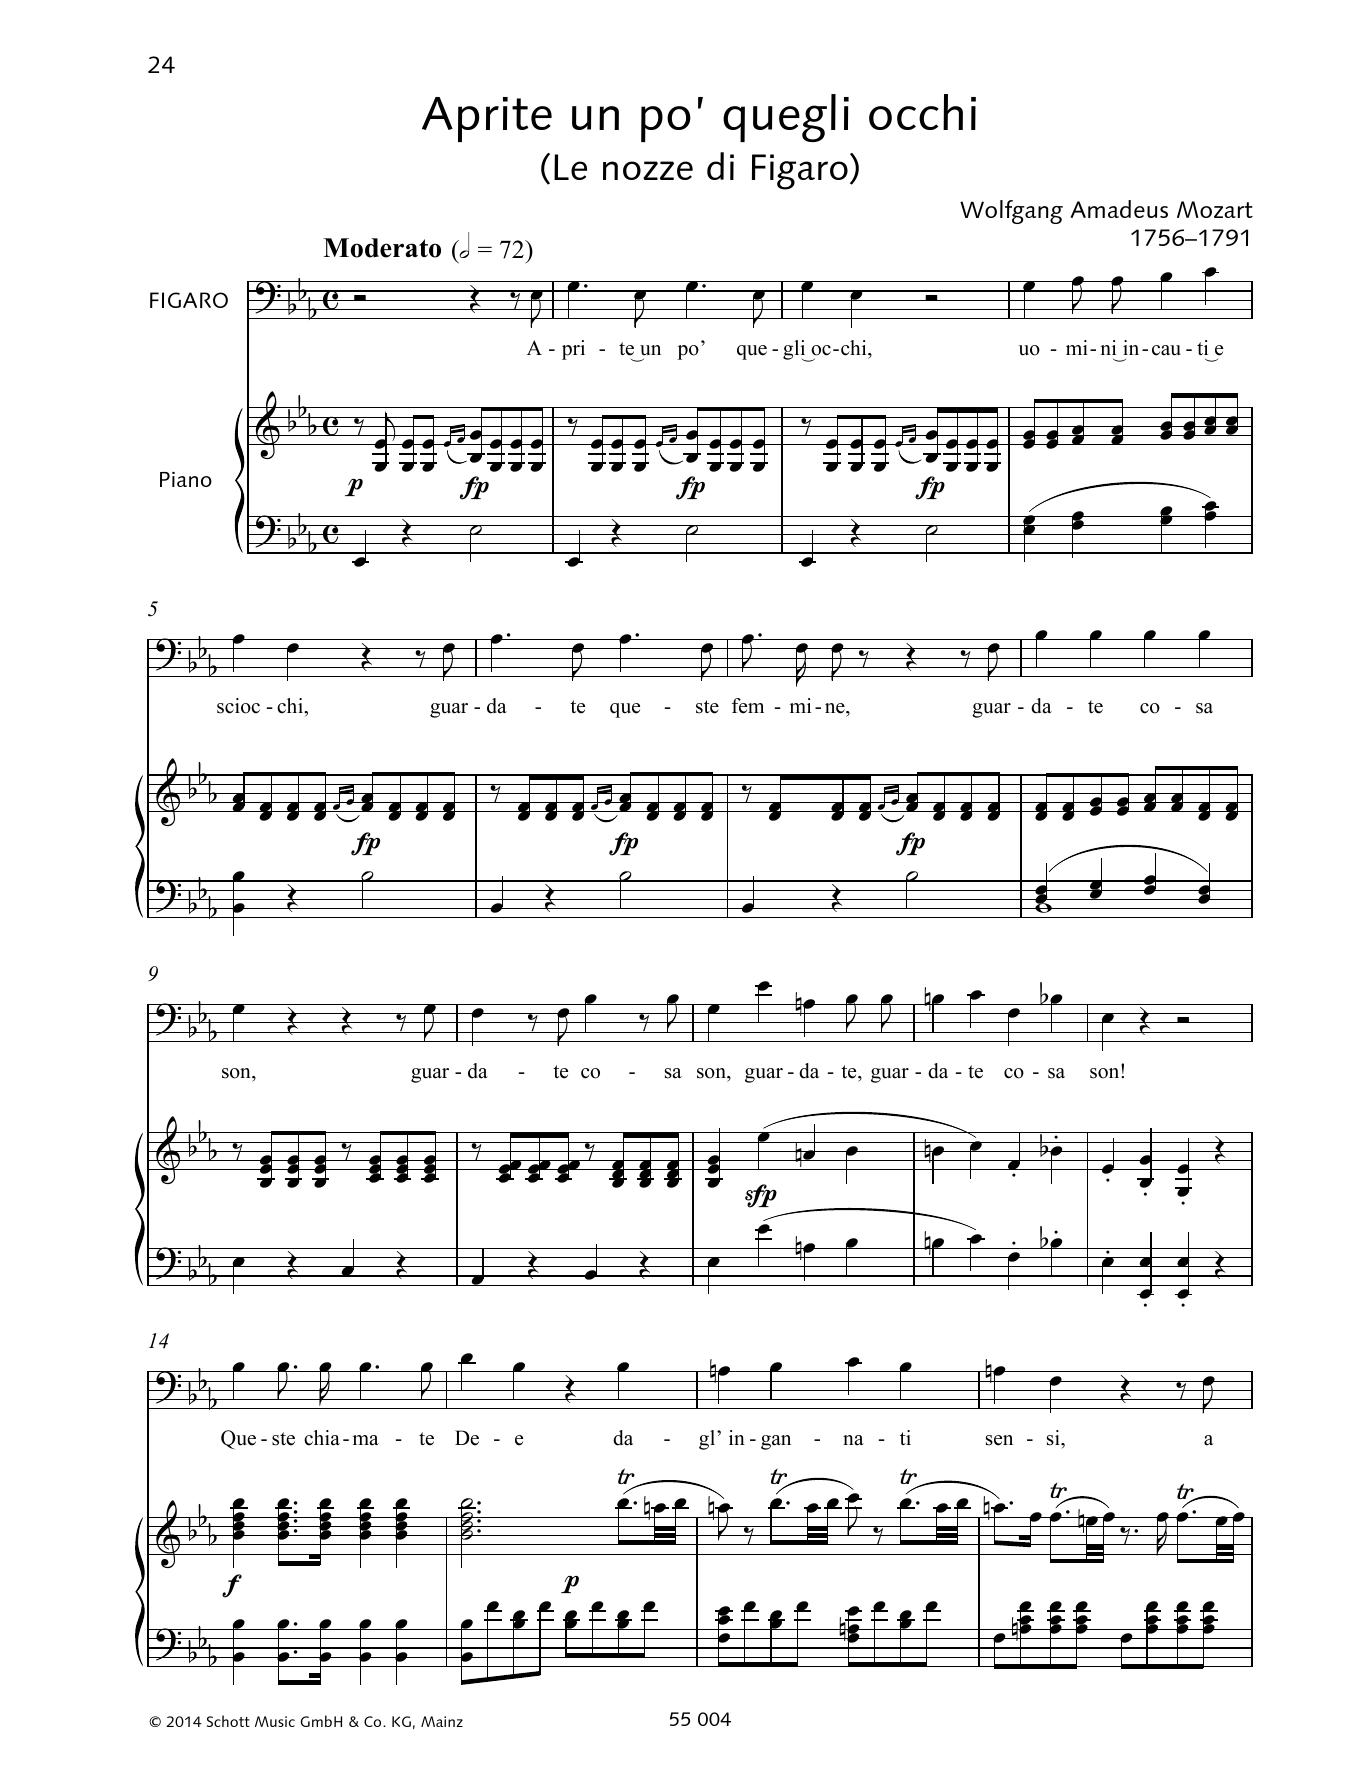 Wolfgang Amadeus Mozart - Aprite un po' quegli occhi